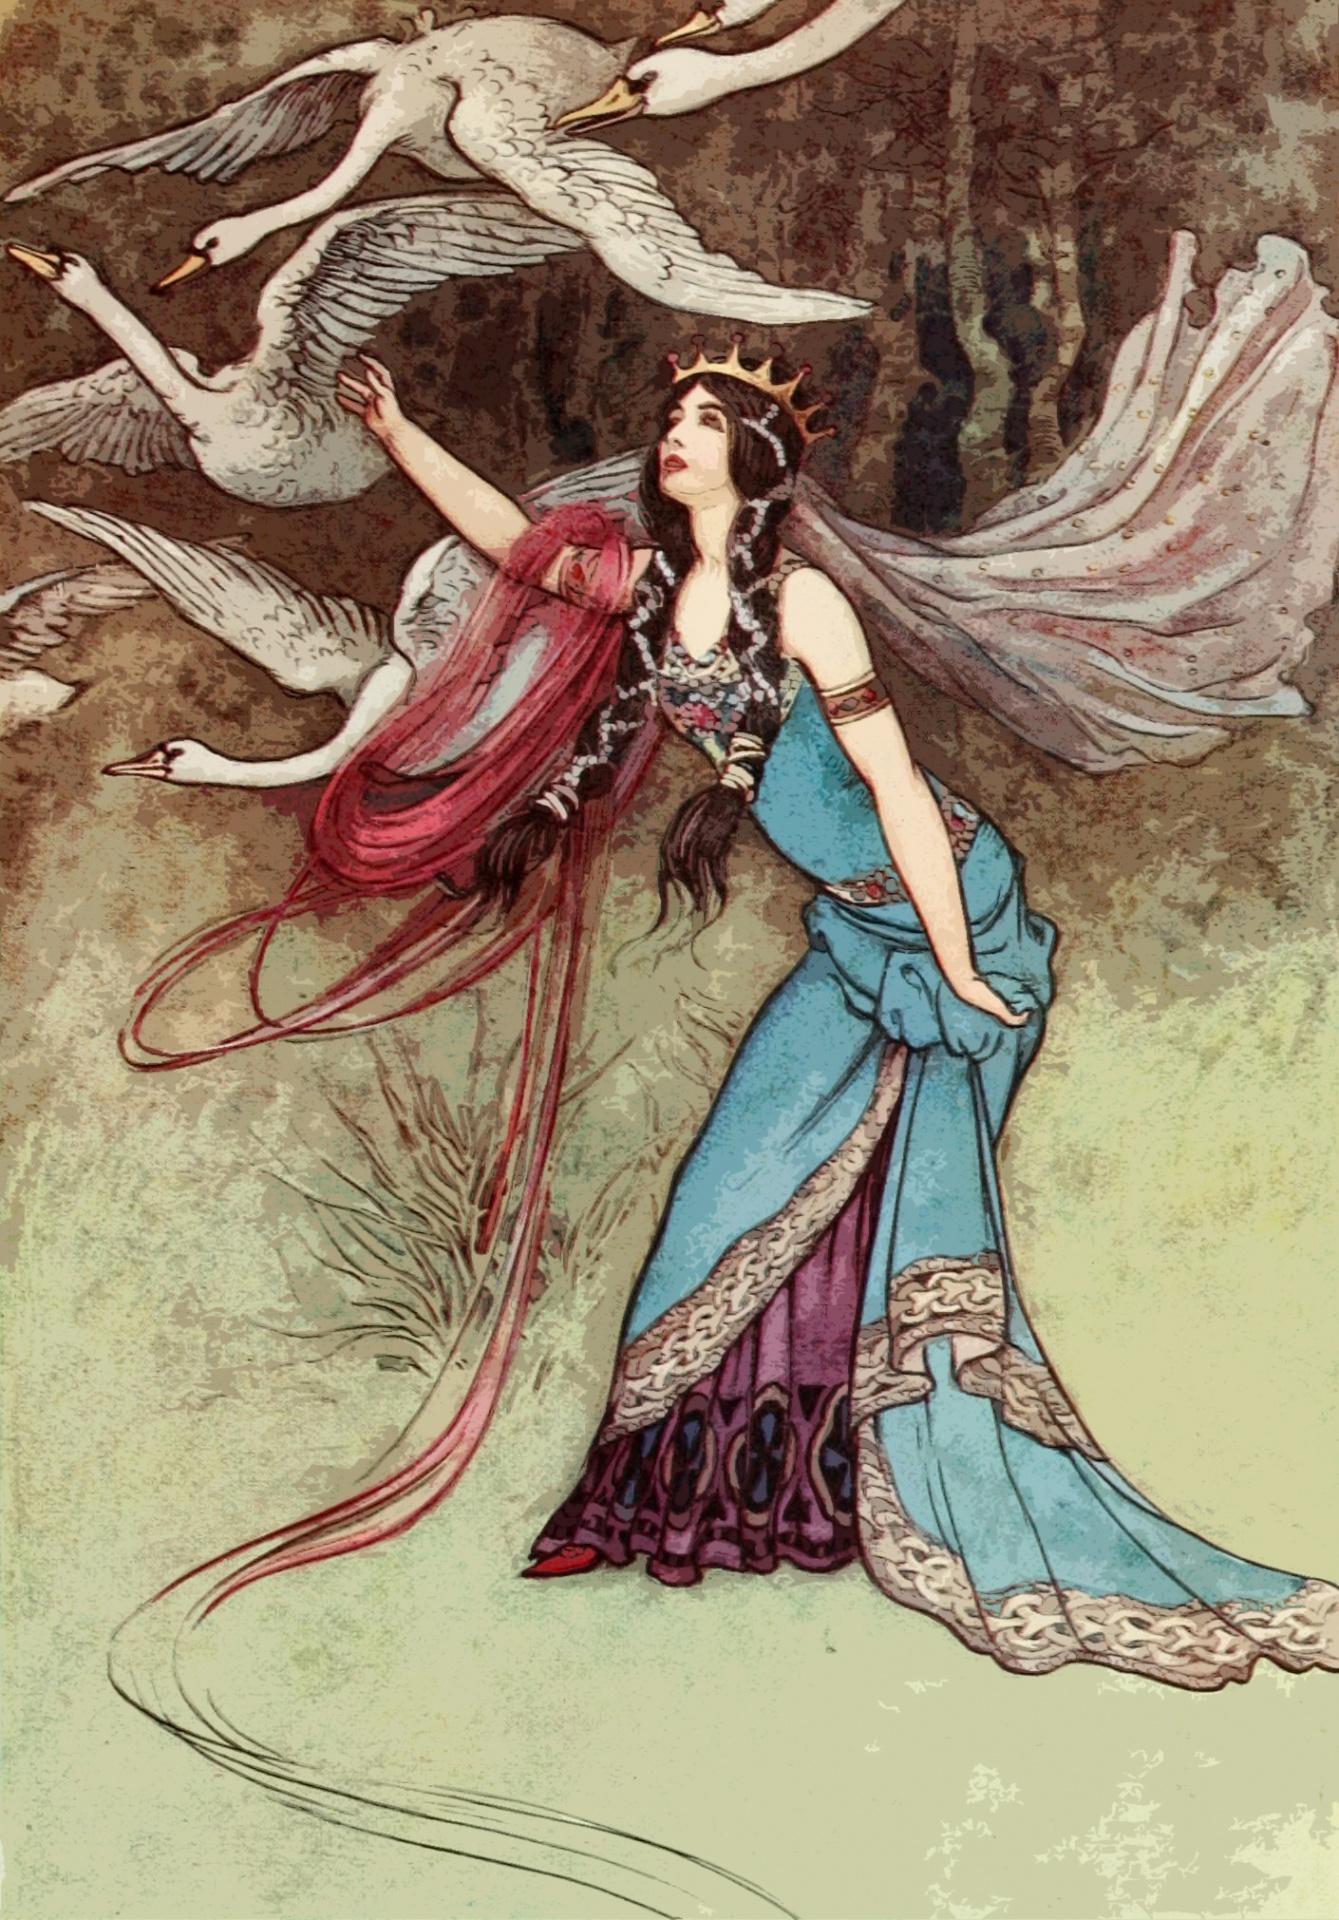 2 Craik, Dinah Maria Mulock. The Fairy Book. Warwick Goble, illustrator. London Macmillan _ Co. 1913